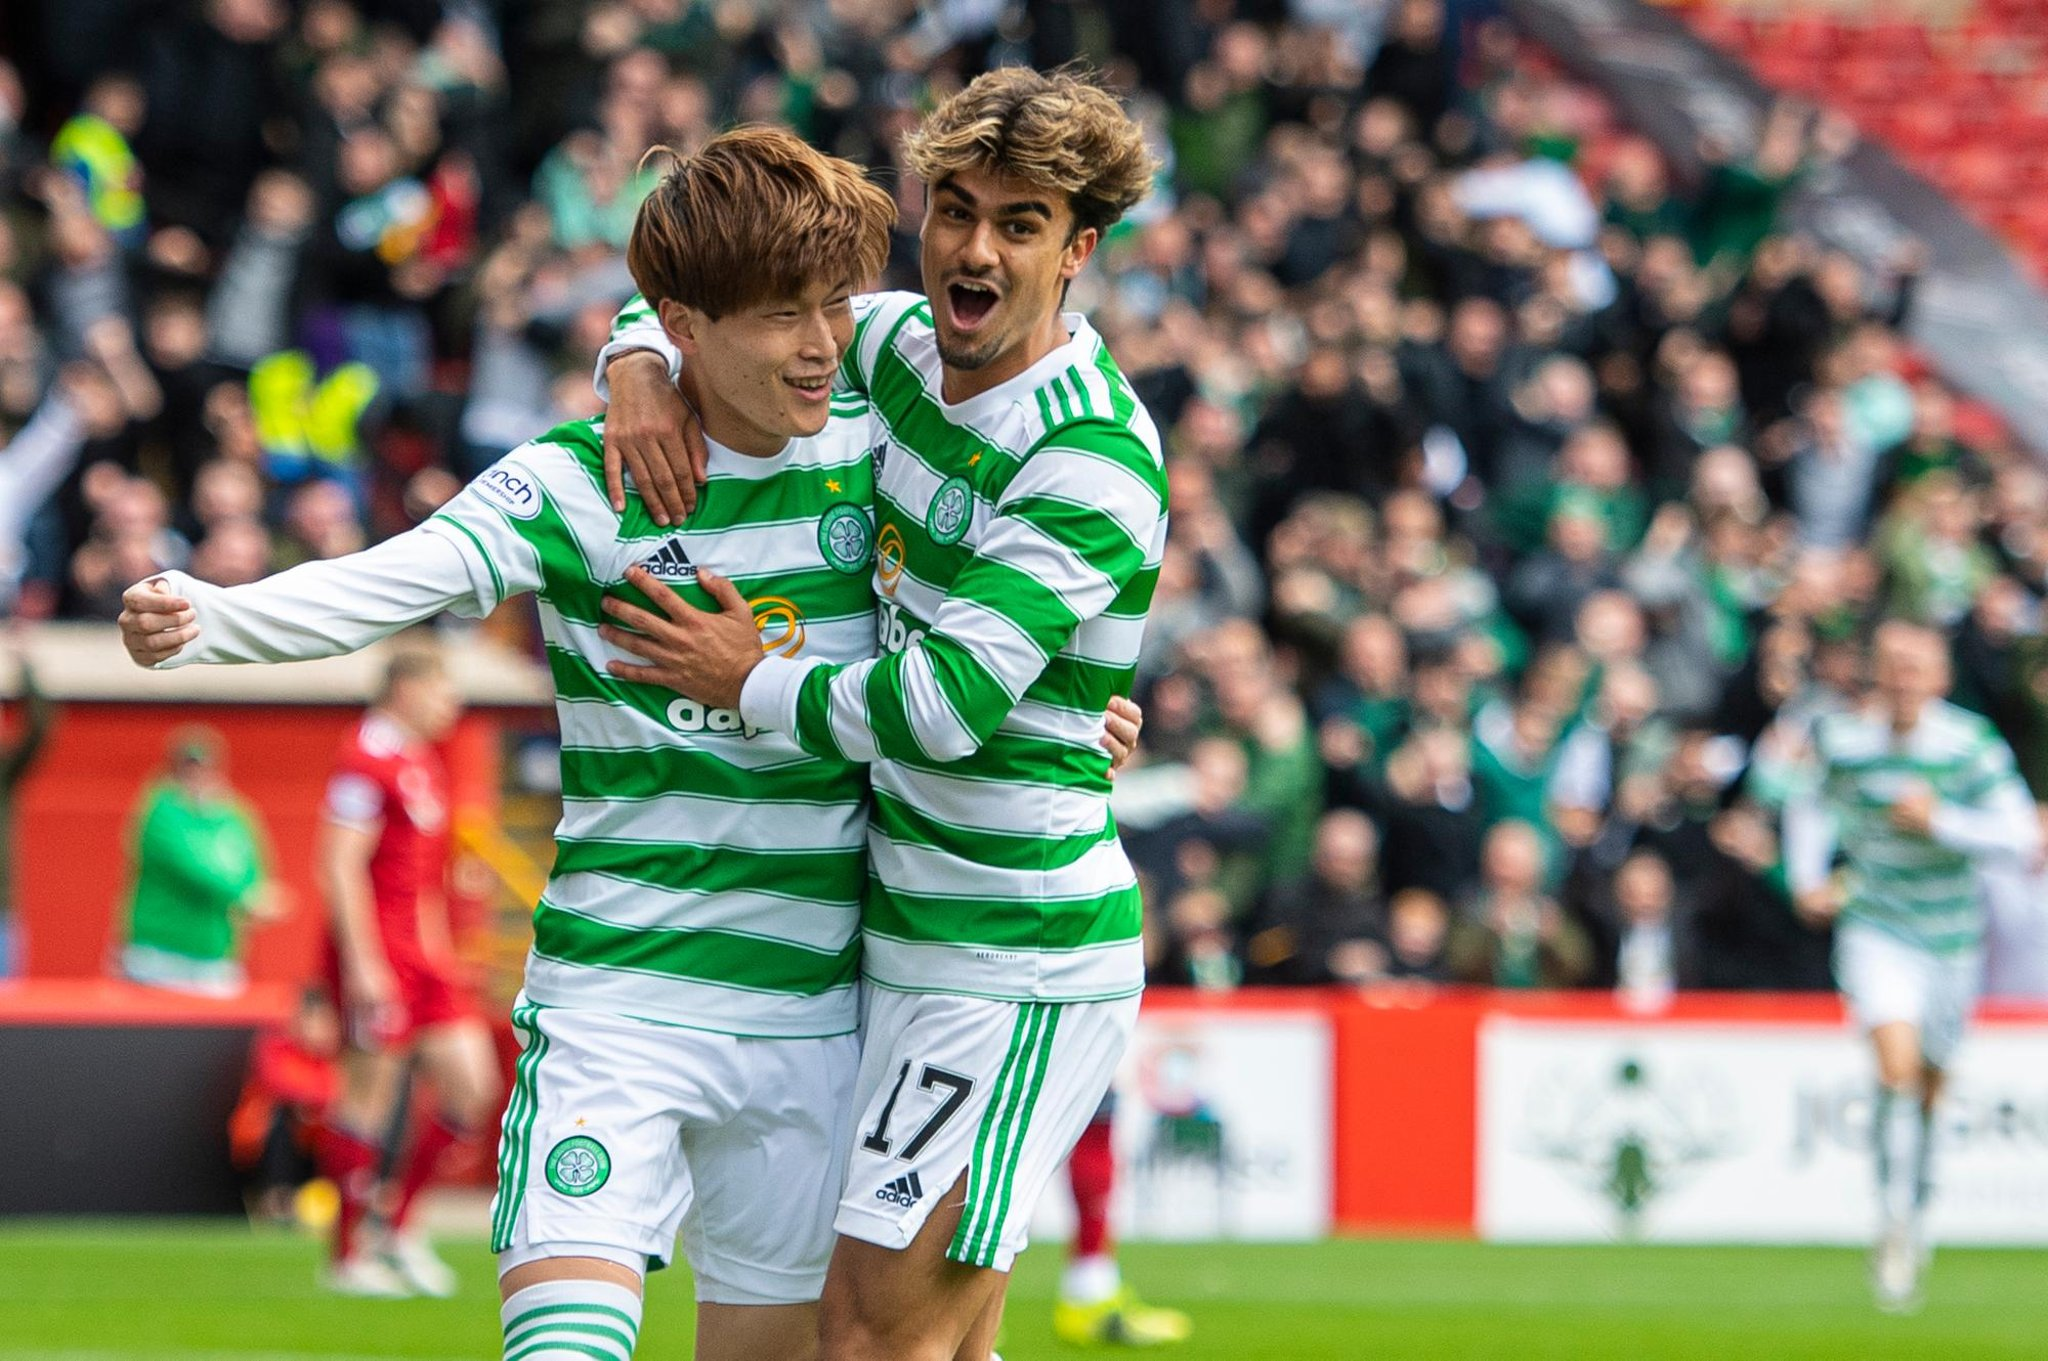 Pemain sayap Celtic Jota mengungkapkan sikap luar biasa untuk membina persahabatan dengan rekan setimnya Kyogo Furuhashi